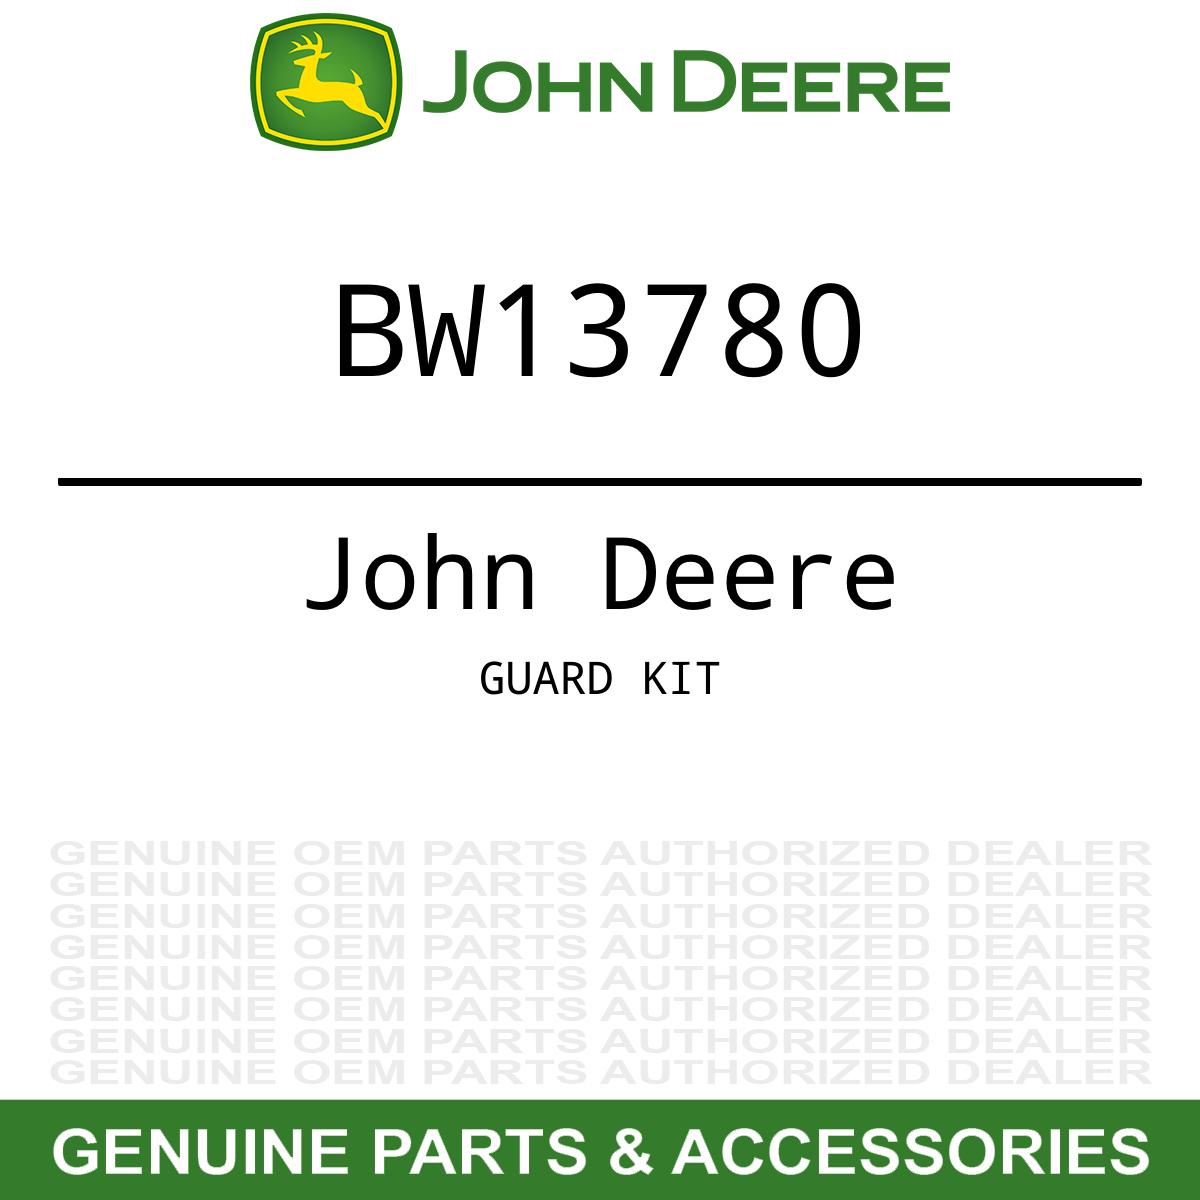 John Deere 5200 Tractor Parts Tops S. Oem Guard Kit John Deere Tractor 1200x1200 5200 Parts. John Deere. John Deere 5200 Diagram At Scoala.co